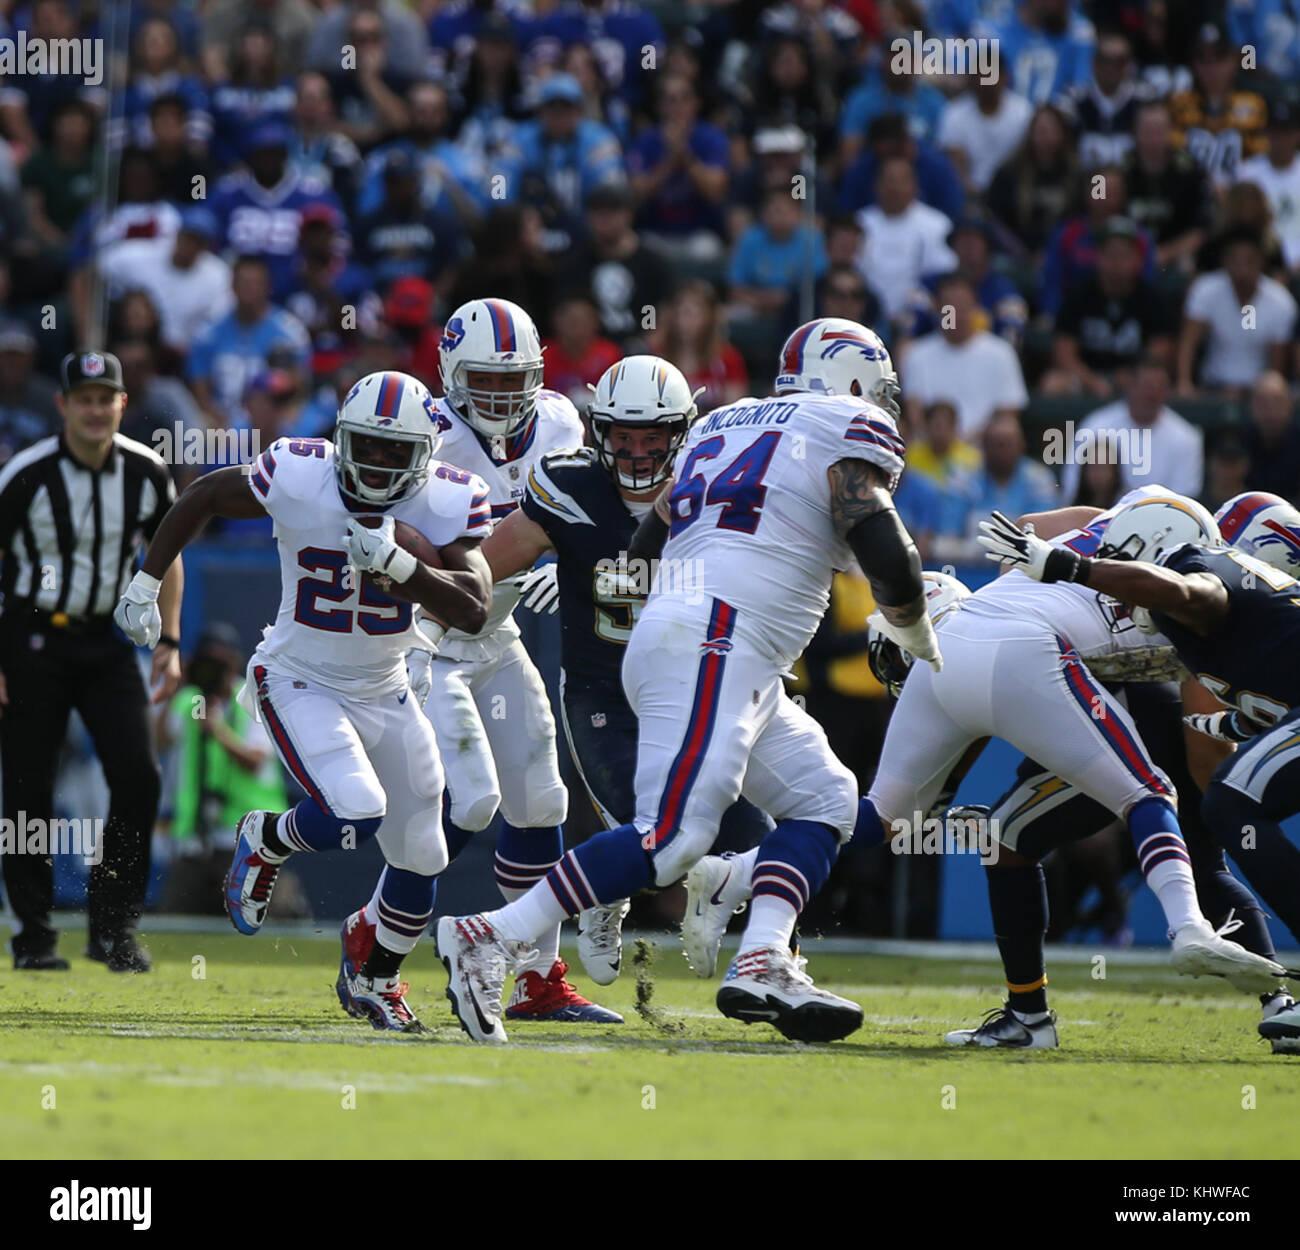 1ba65029505 Buffalo Bills running back LeSean McCoy  25 running during the NFL Buffalo  Bills vs Los Angeles Chargers at the Stubhub Center in Carson